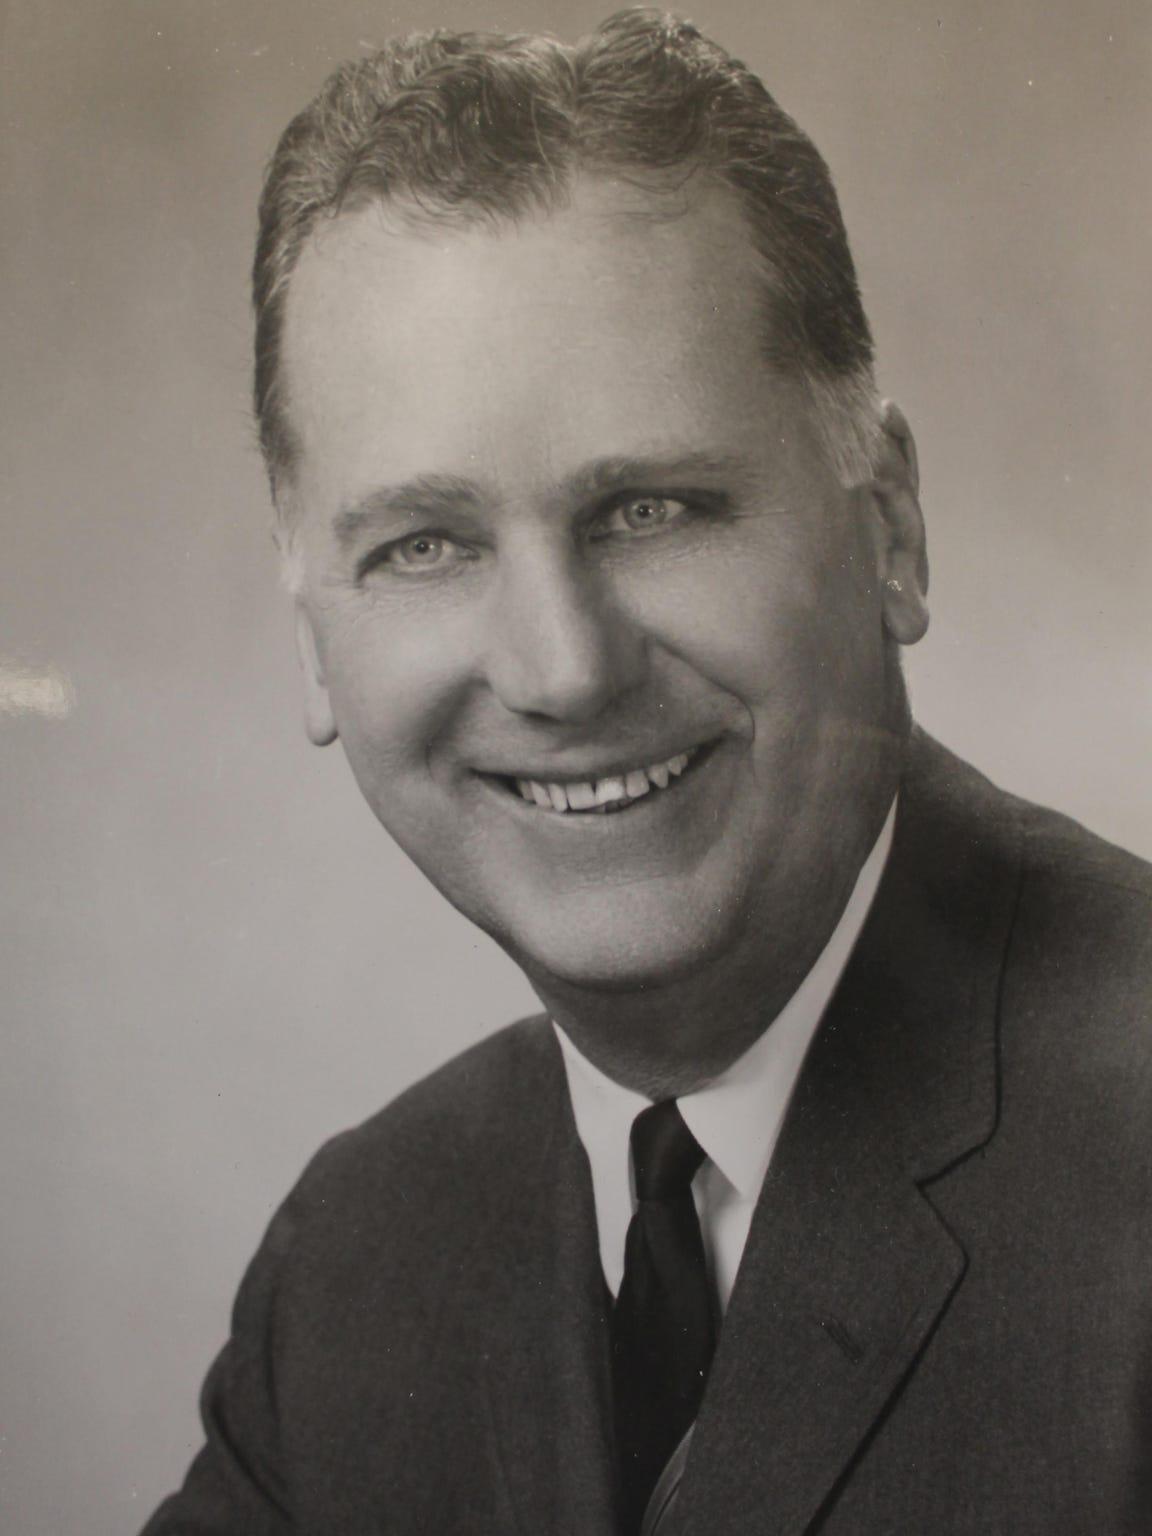 Coach Bob Vanatta appears in an undated photograph